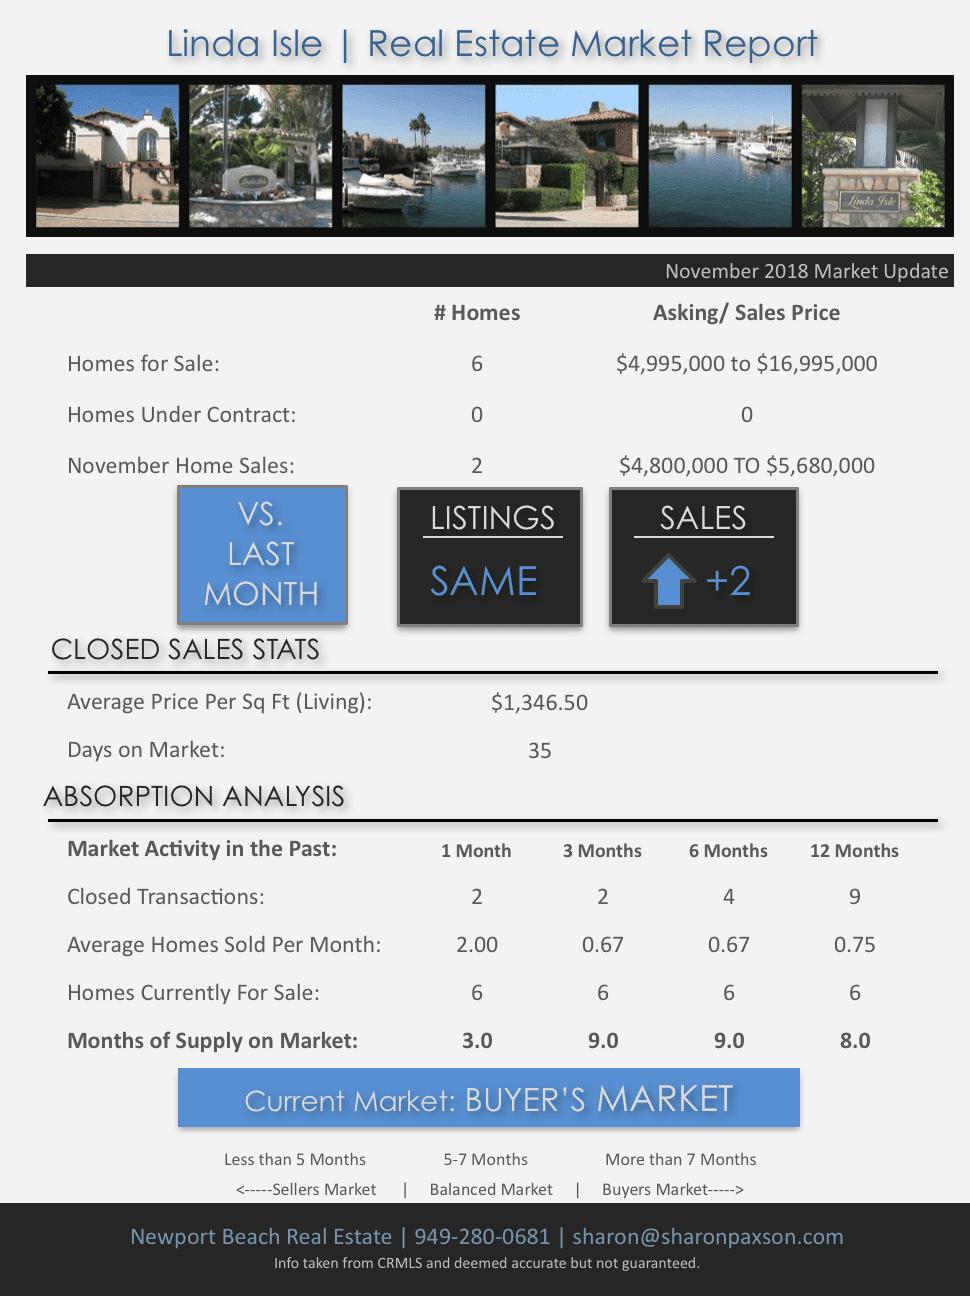 How is the Real Estate Market on Linda Isle in Newport Beach CA November 2018?